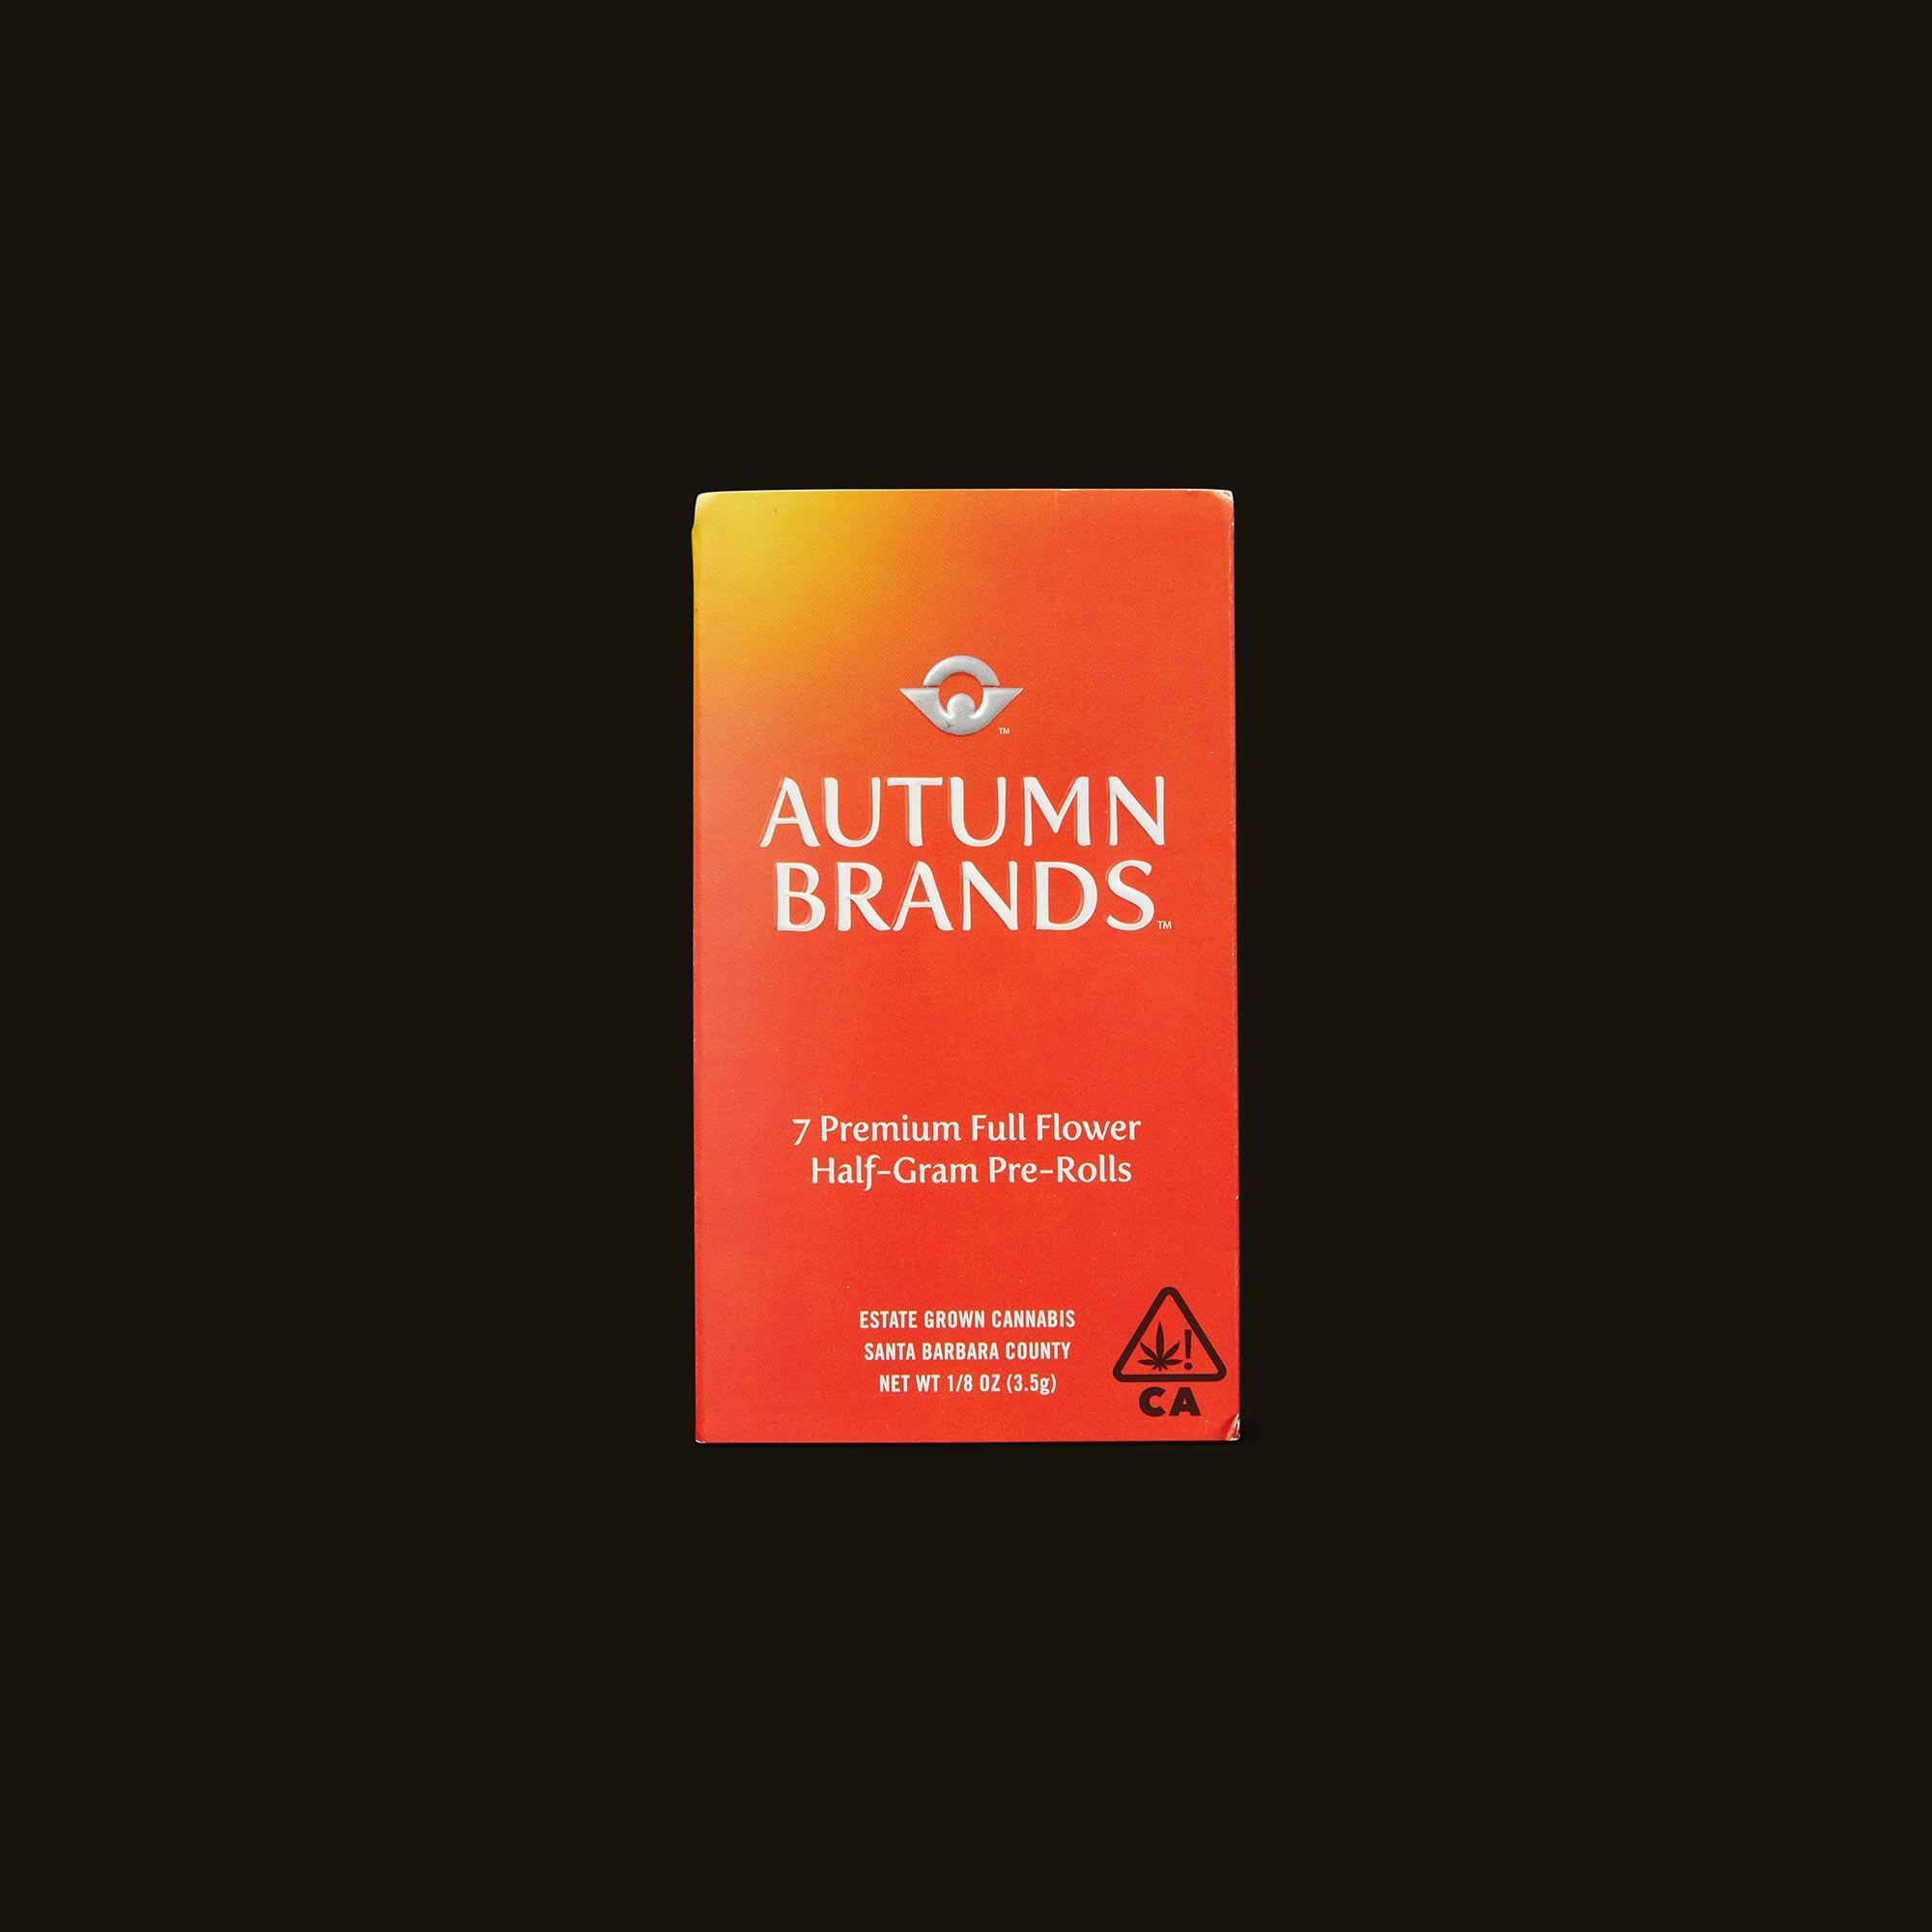 Autumn OG Pre-Roll Pack - Seven 0.5g joints